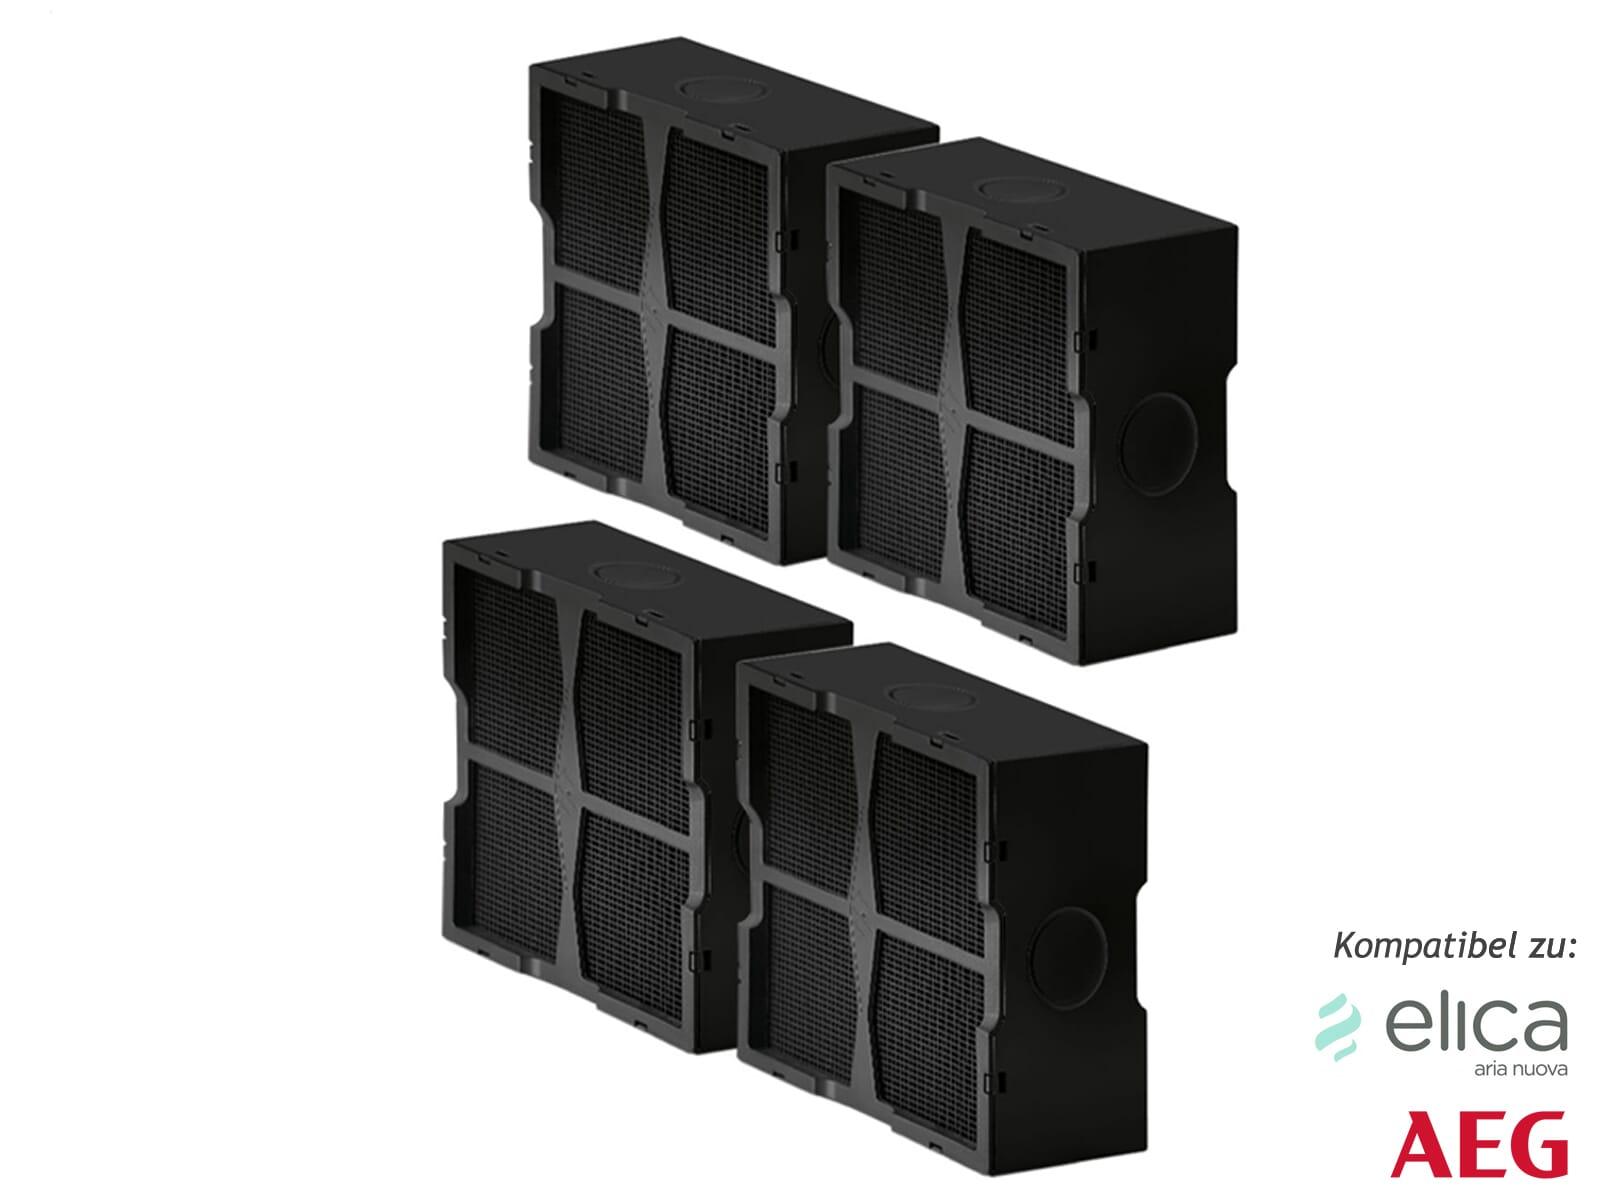 Elica KIT0120952 Keramik-Filter 4 Stück